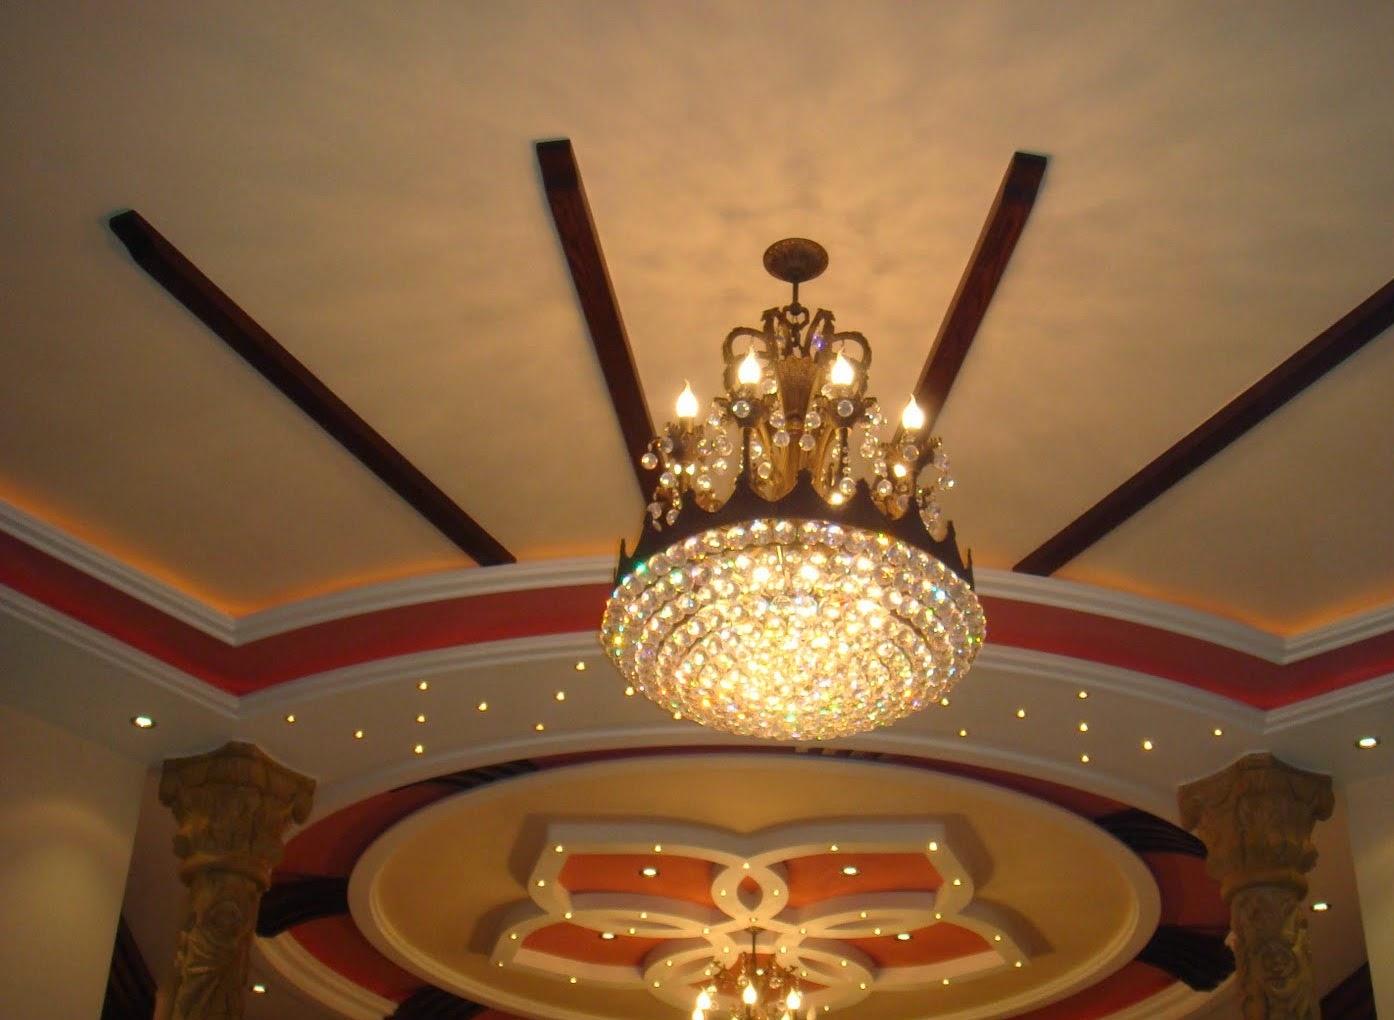 salon marocaine moderne d coration de faux plafonds pl tre marocain. Black Bedroom Furniture Sets. Home Design Ideas